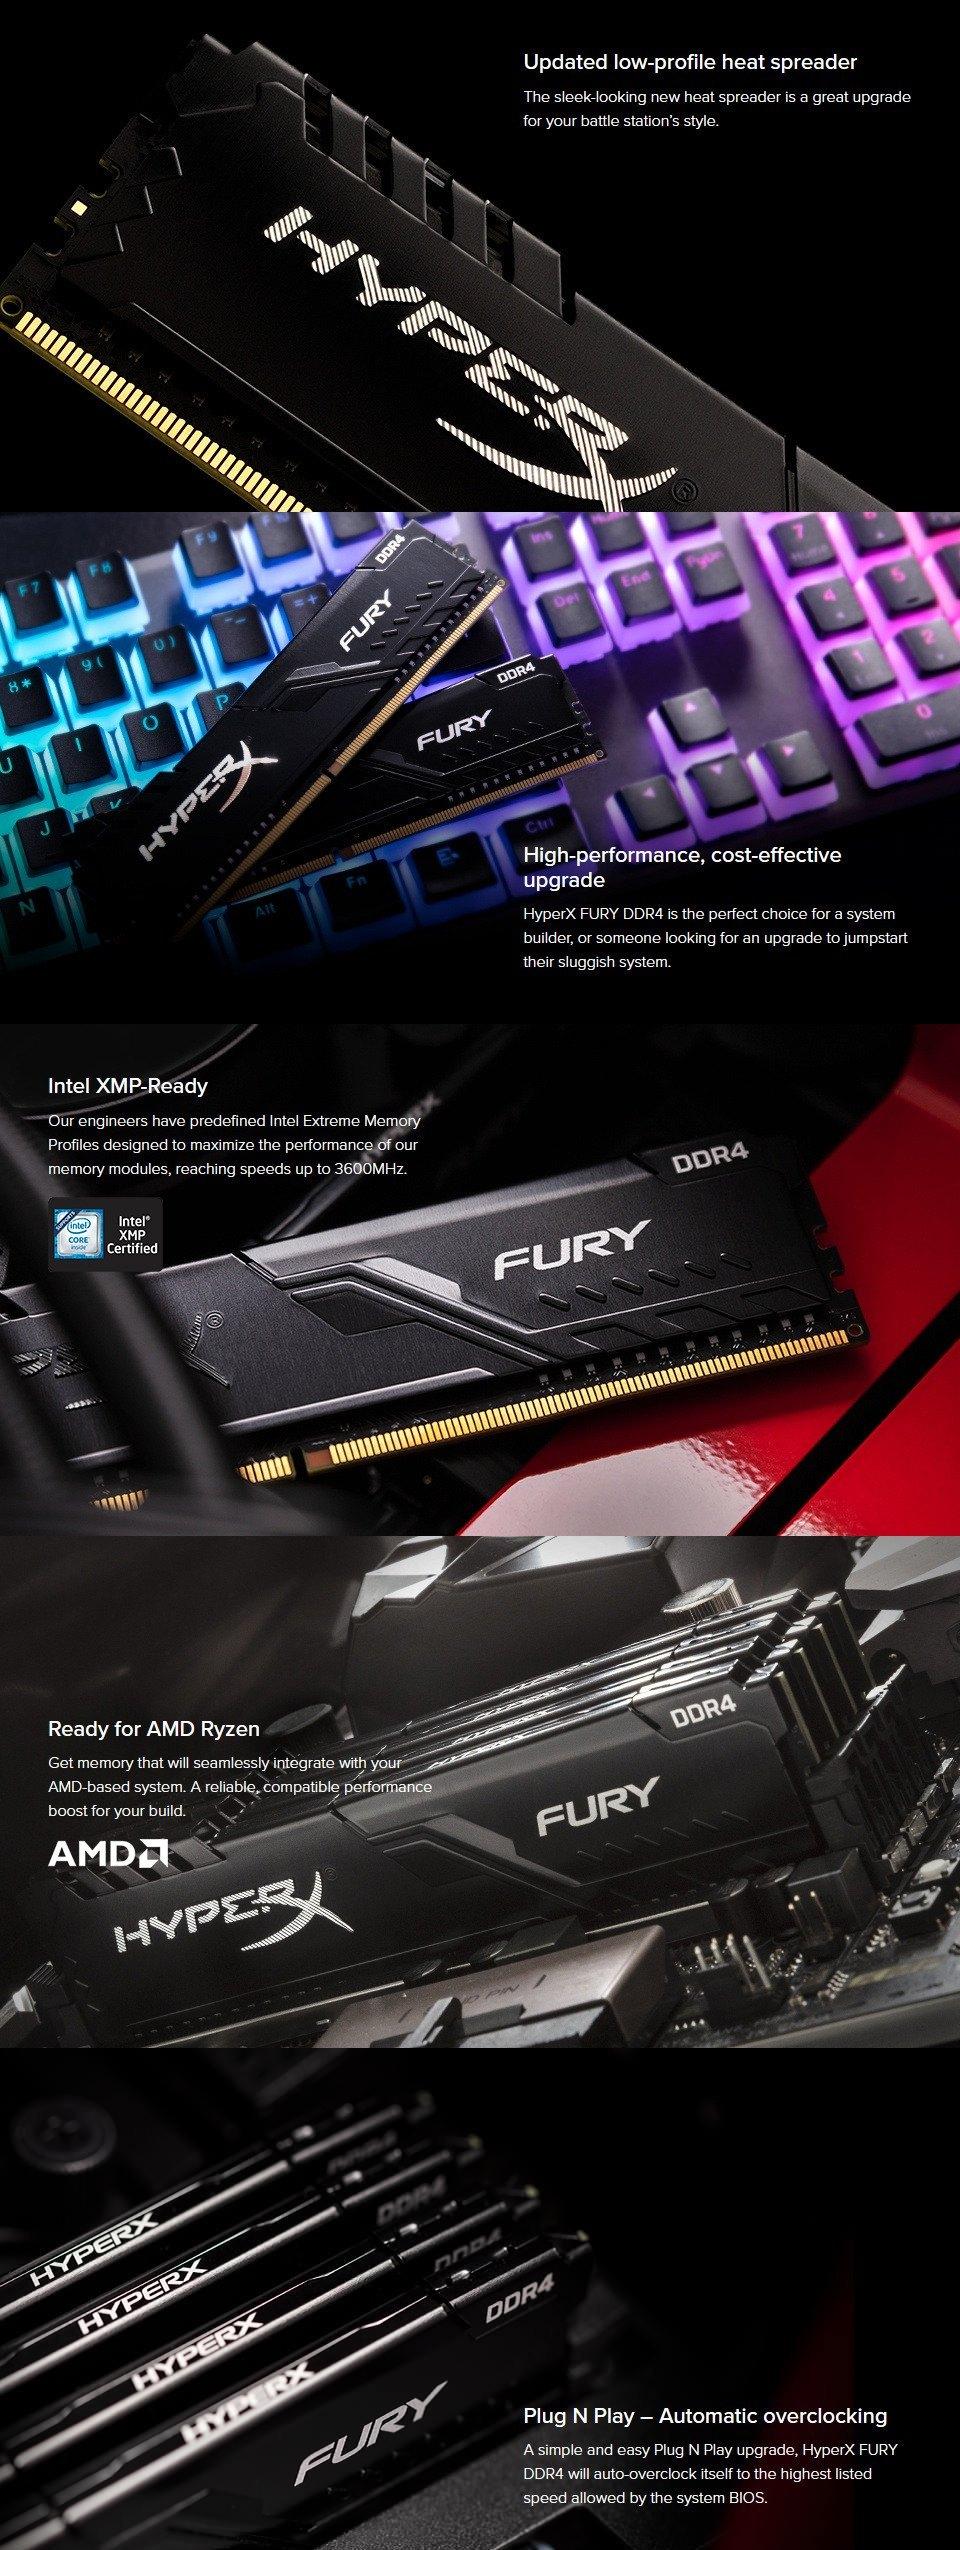 Kingston HyperX Fury 32GB (2x16GB) 3600MHz CL17 DDR4 Black features